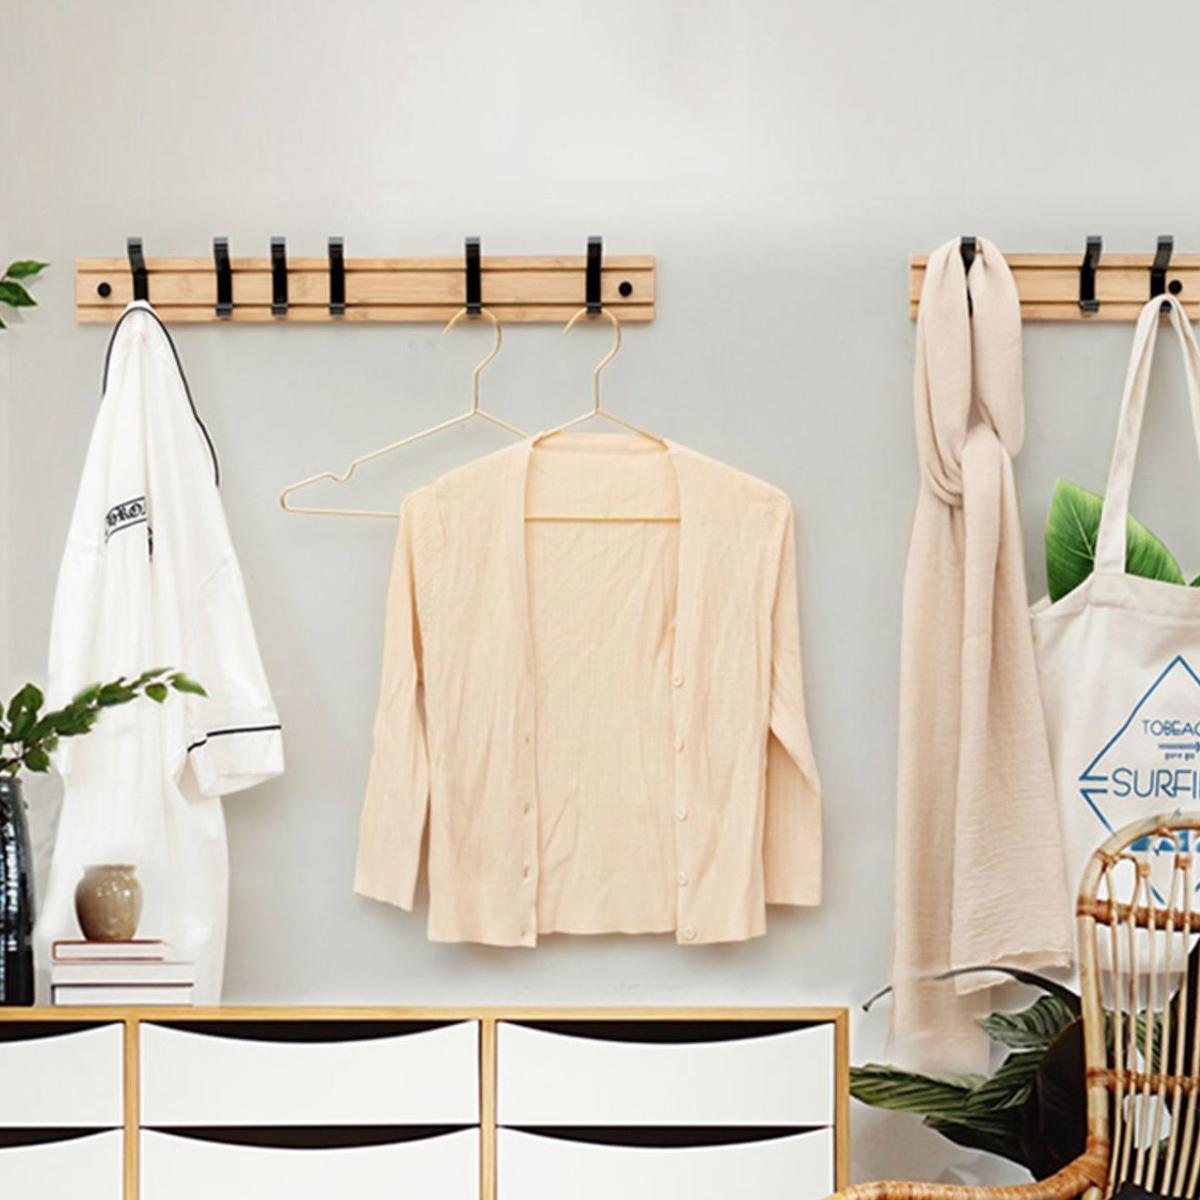 Nordic Fashion Style Bedroom Furniture Coat Rack Clothes Hanger Hooks Living Room Closet Bamboo Hat Racks Coat Hanger Wall Hook 4